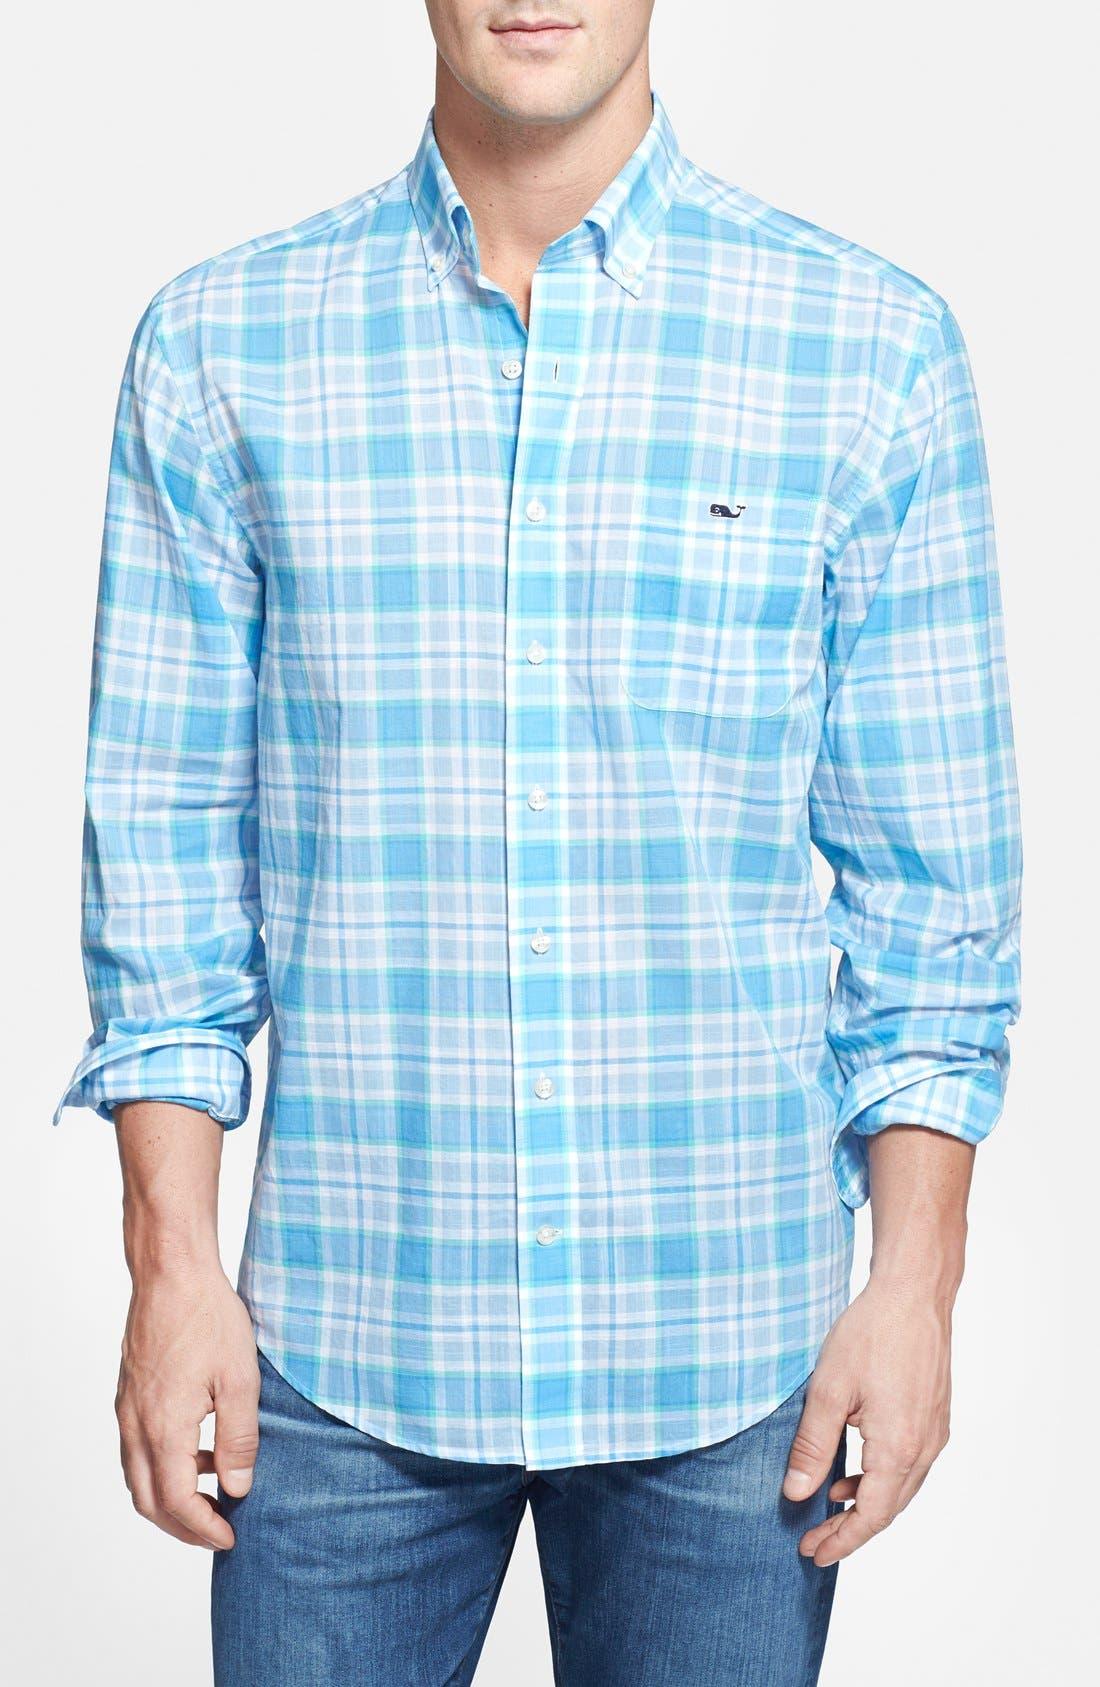 Alternate Image 1 Selected - Vineyard Vines 'Tucker' Classic Fit Plaid Sport Shirt